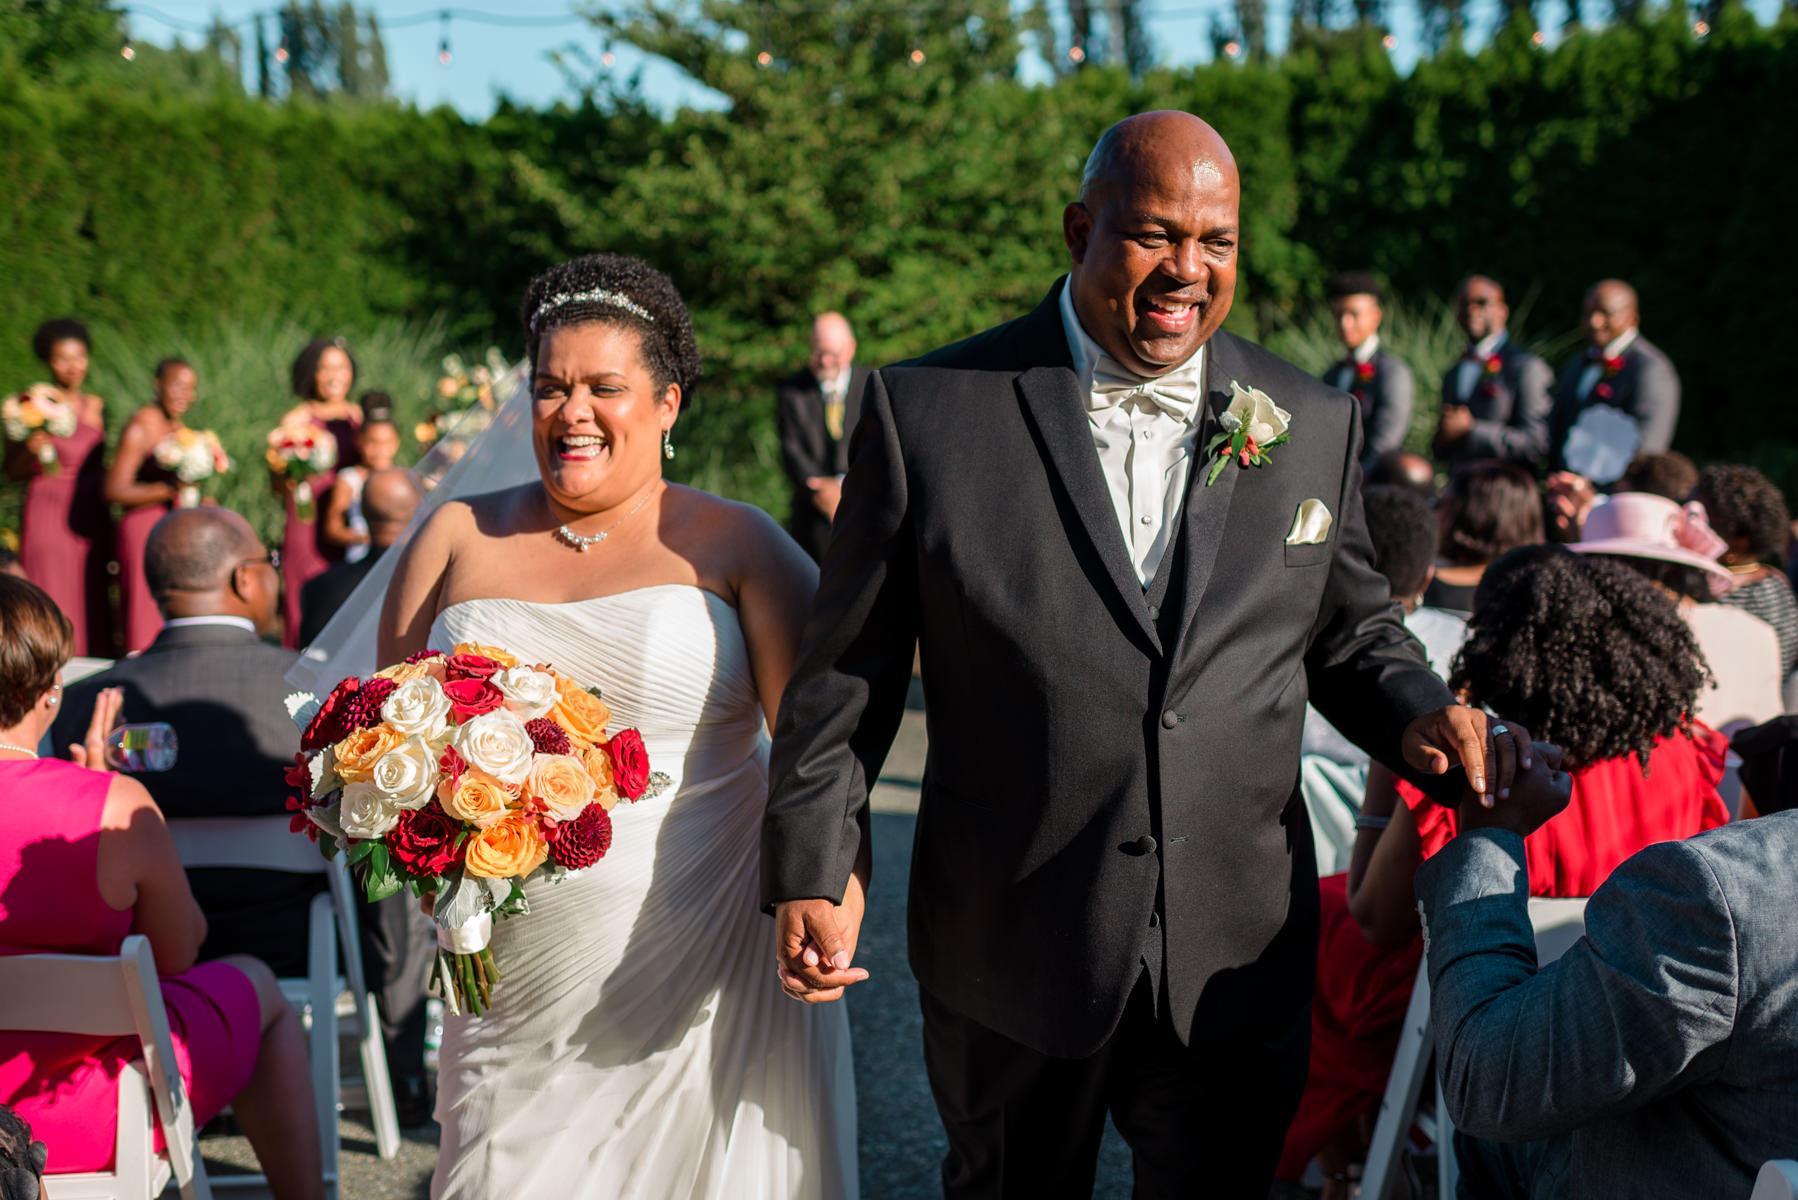 Andrew Tat - Documentary Wedding Photography - Columbia Winery - Woodinville, Washington -Patricia & Teffin - 17.jpg